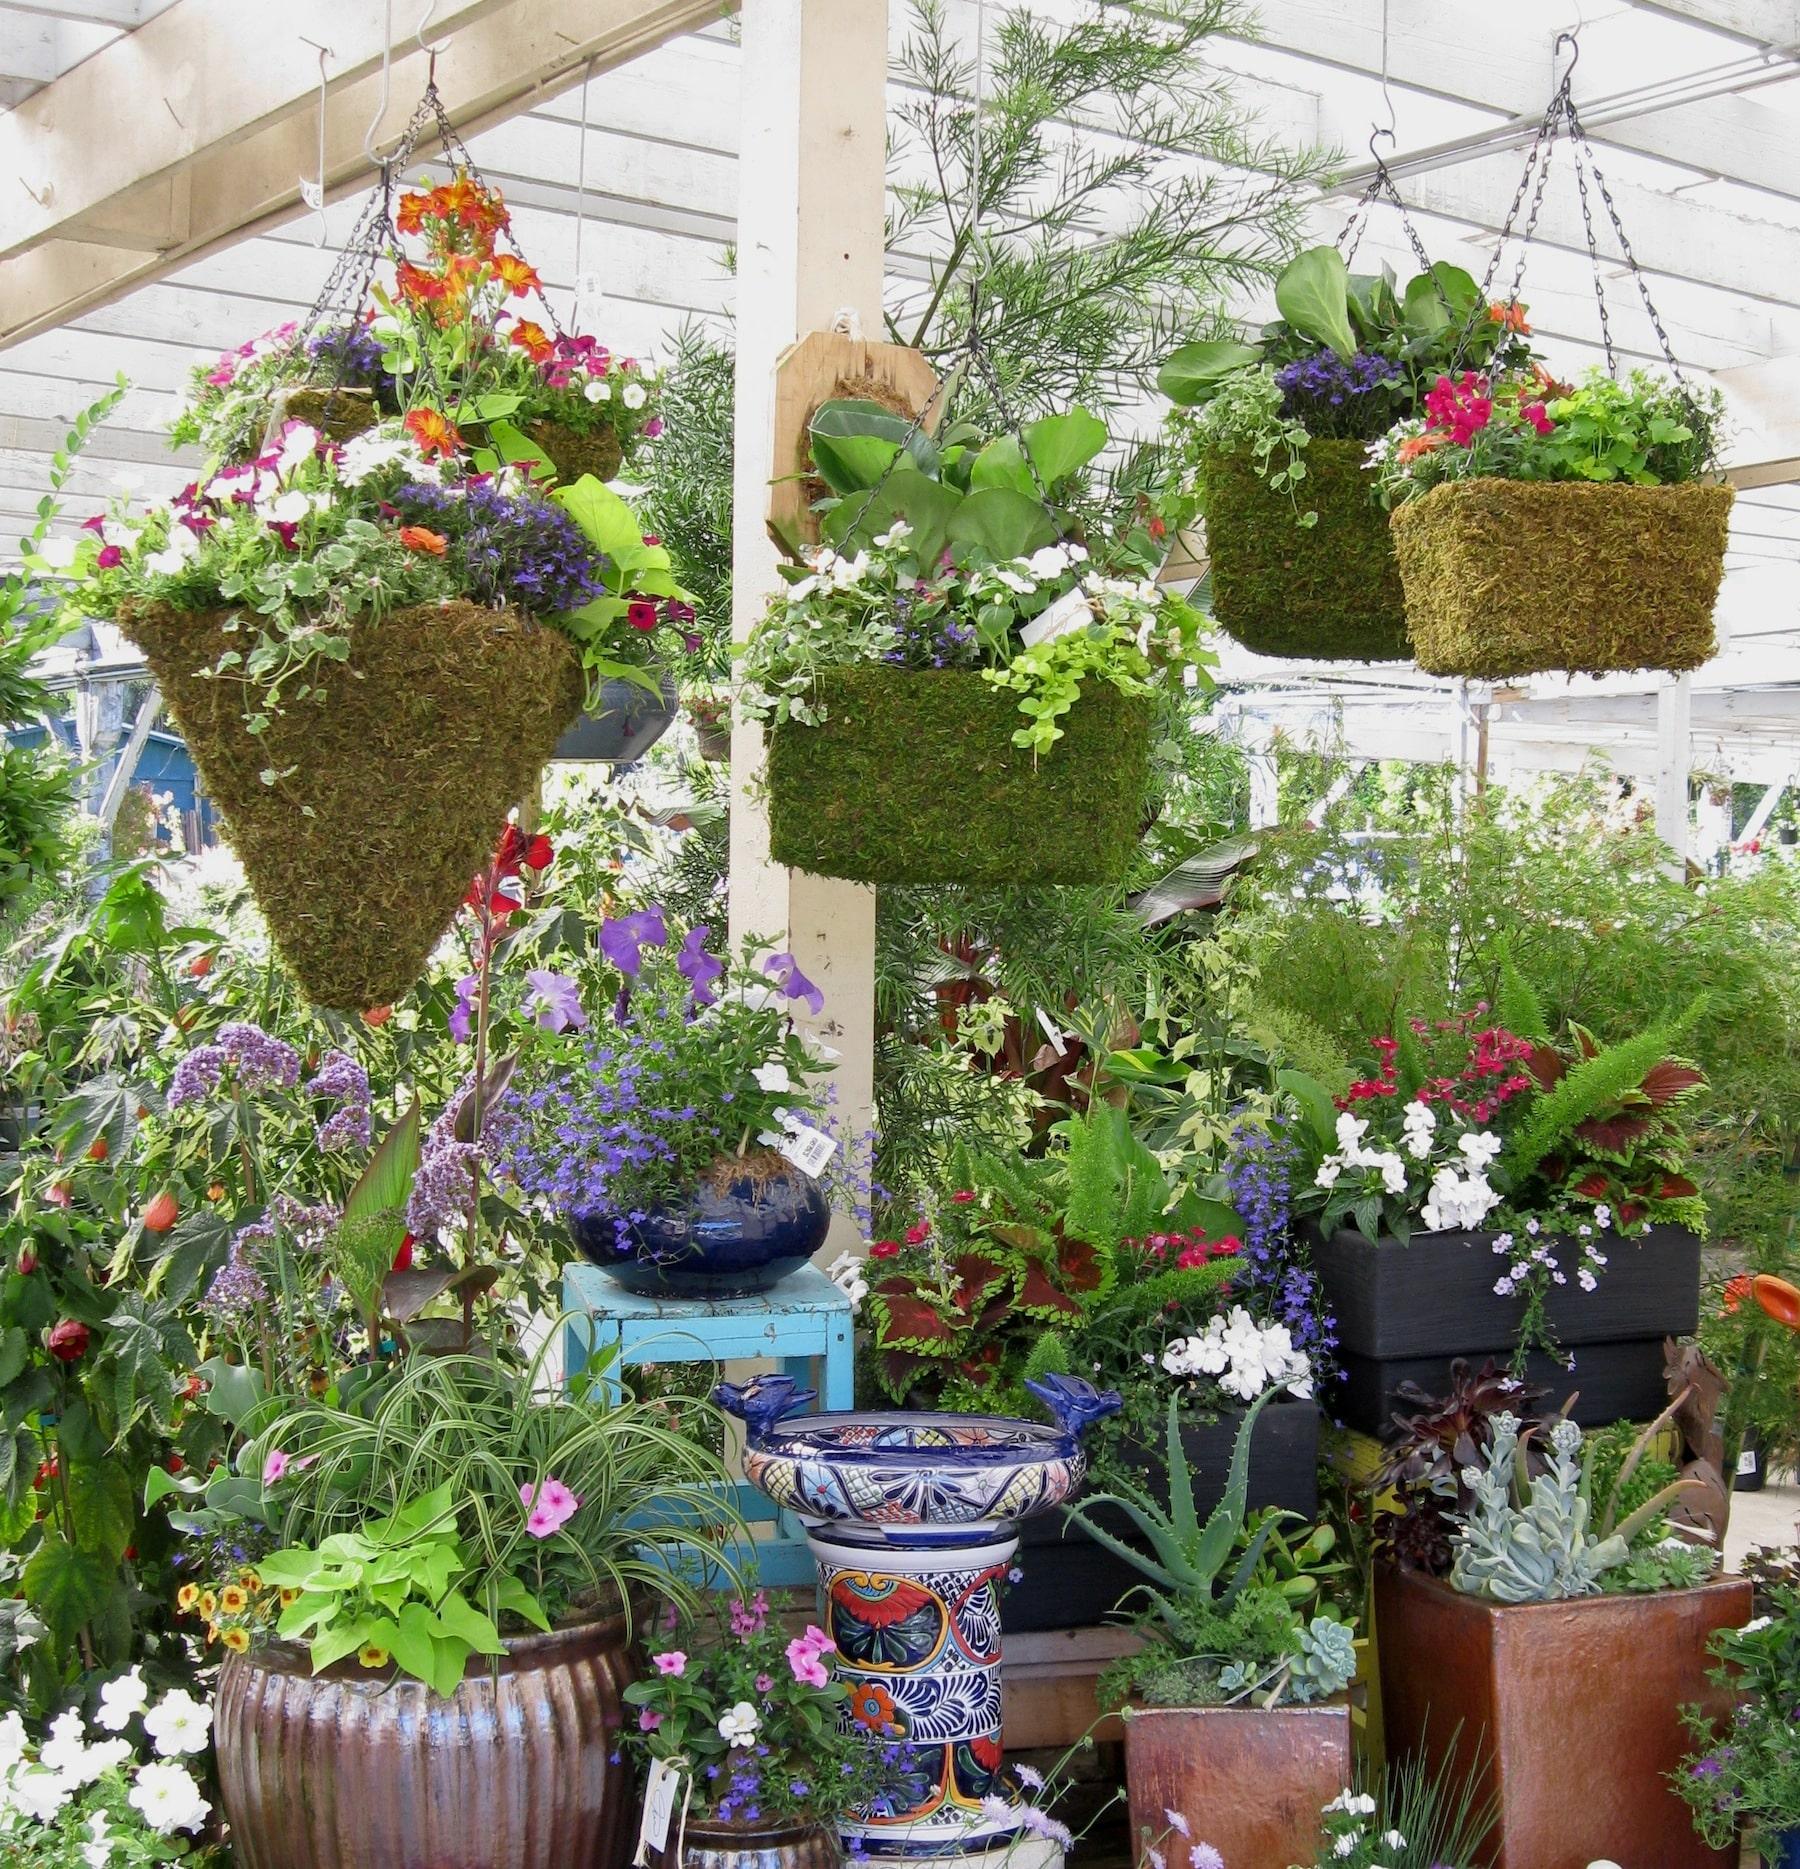 Garden Centre: Sloat Garden Center